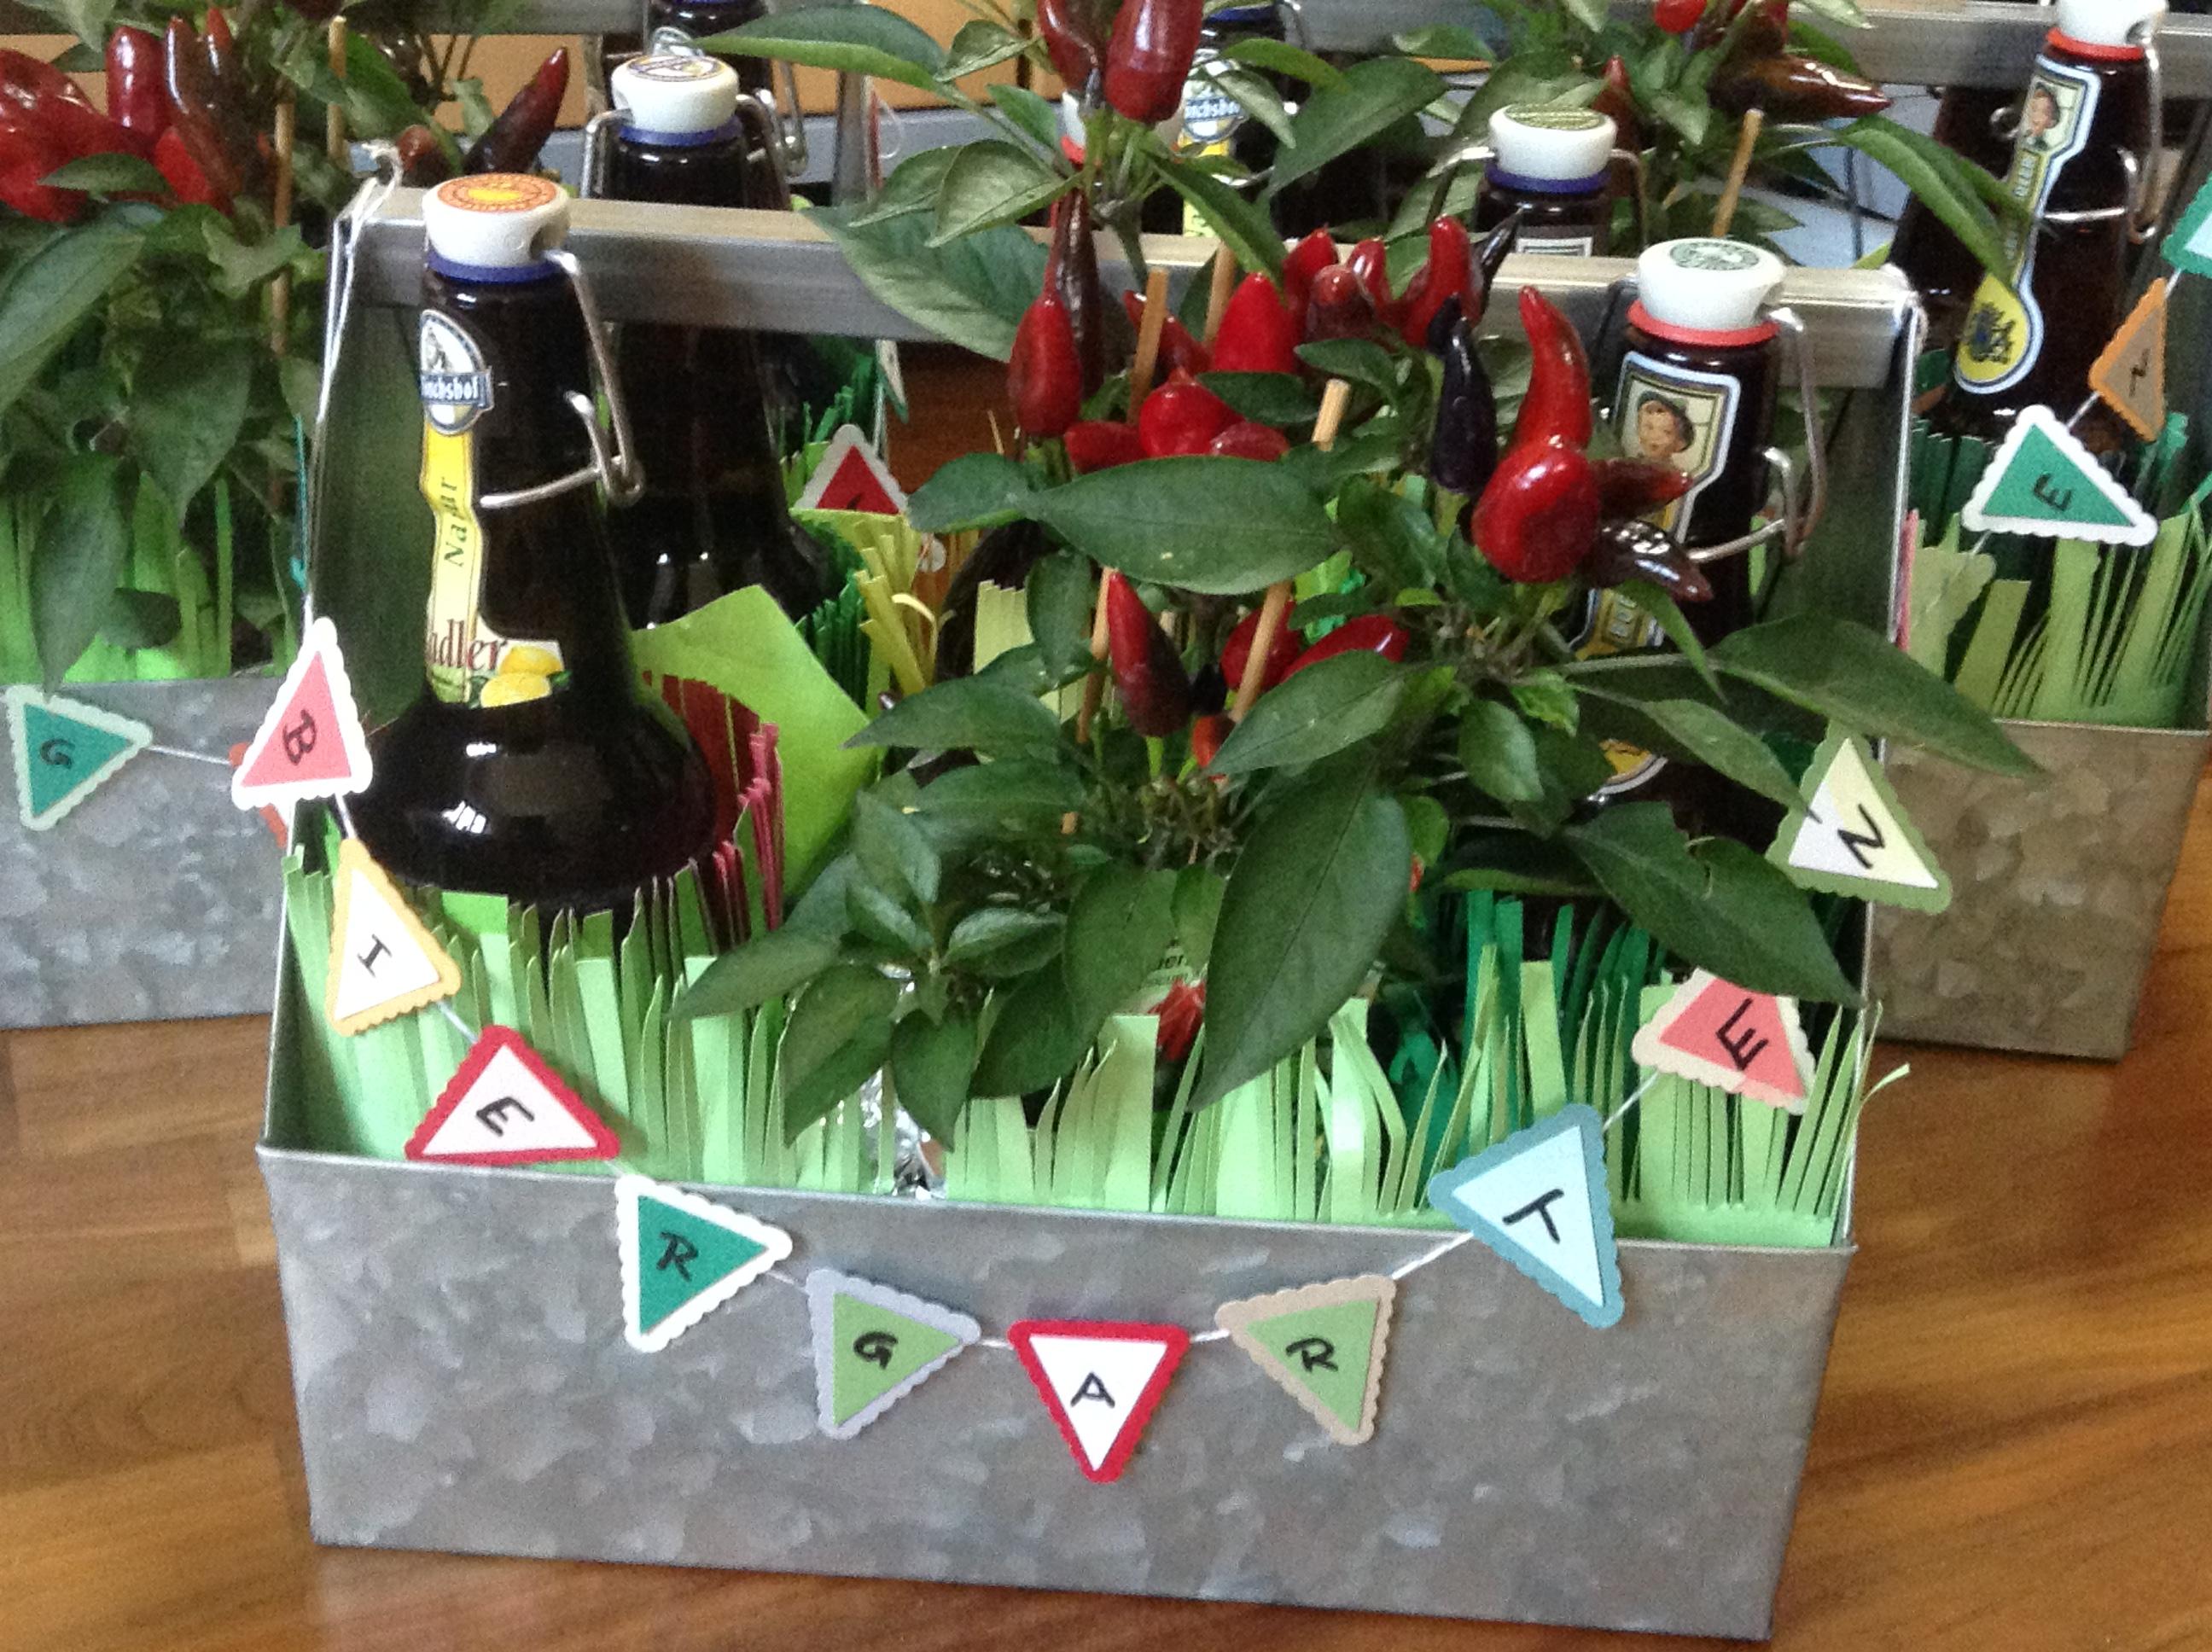 Garten Geschenkideen Kräutergarten Geschenke Für Den Mann Geschenke